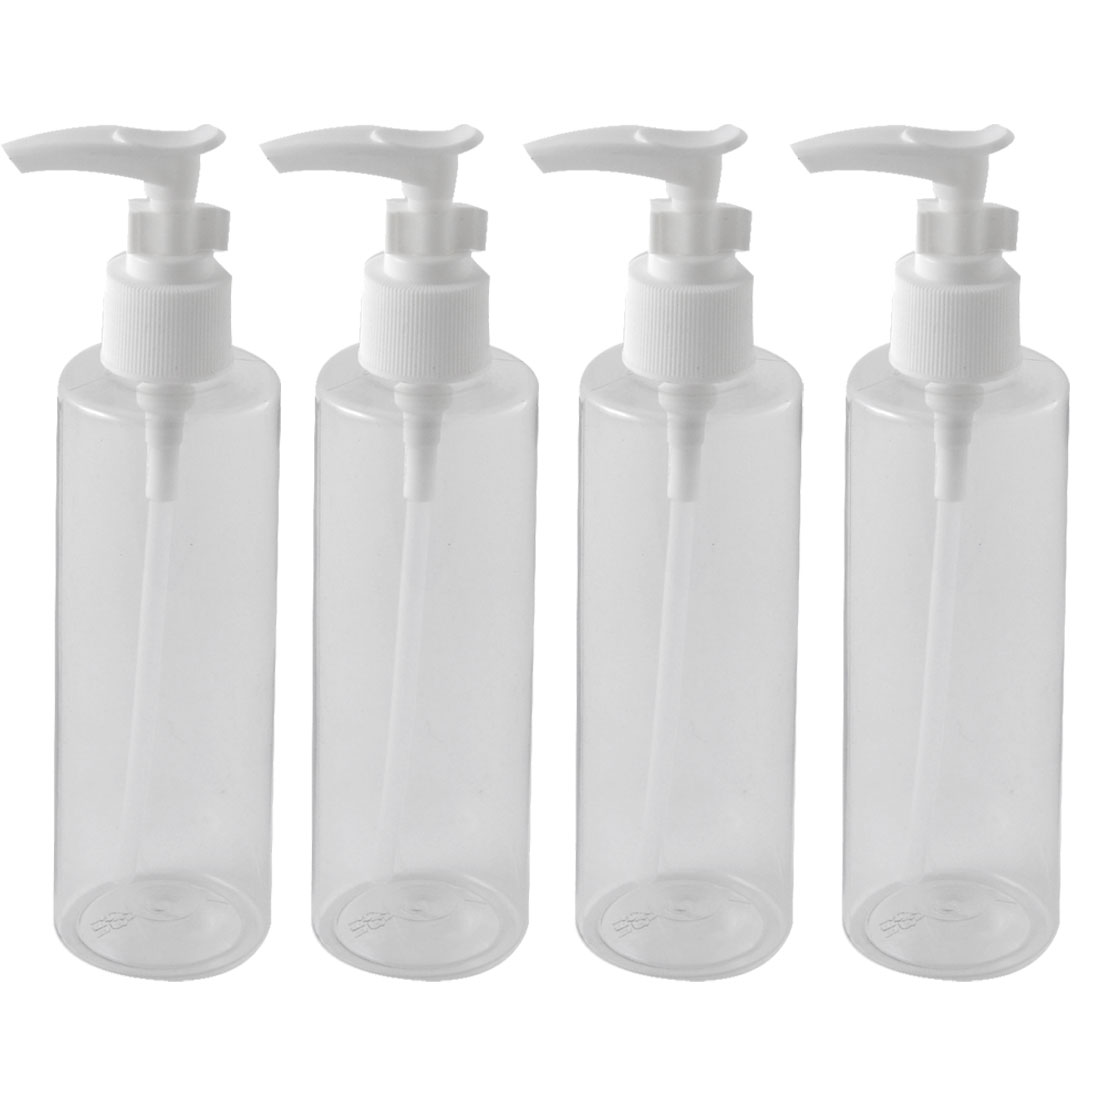 Traveling Woman Plastic Shampoo Cosmetic Emulsion Spray Press Bottle Clear 200ml 4pcs